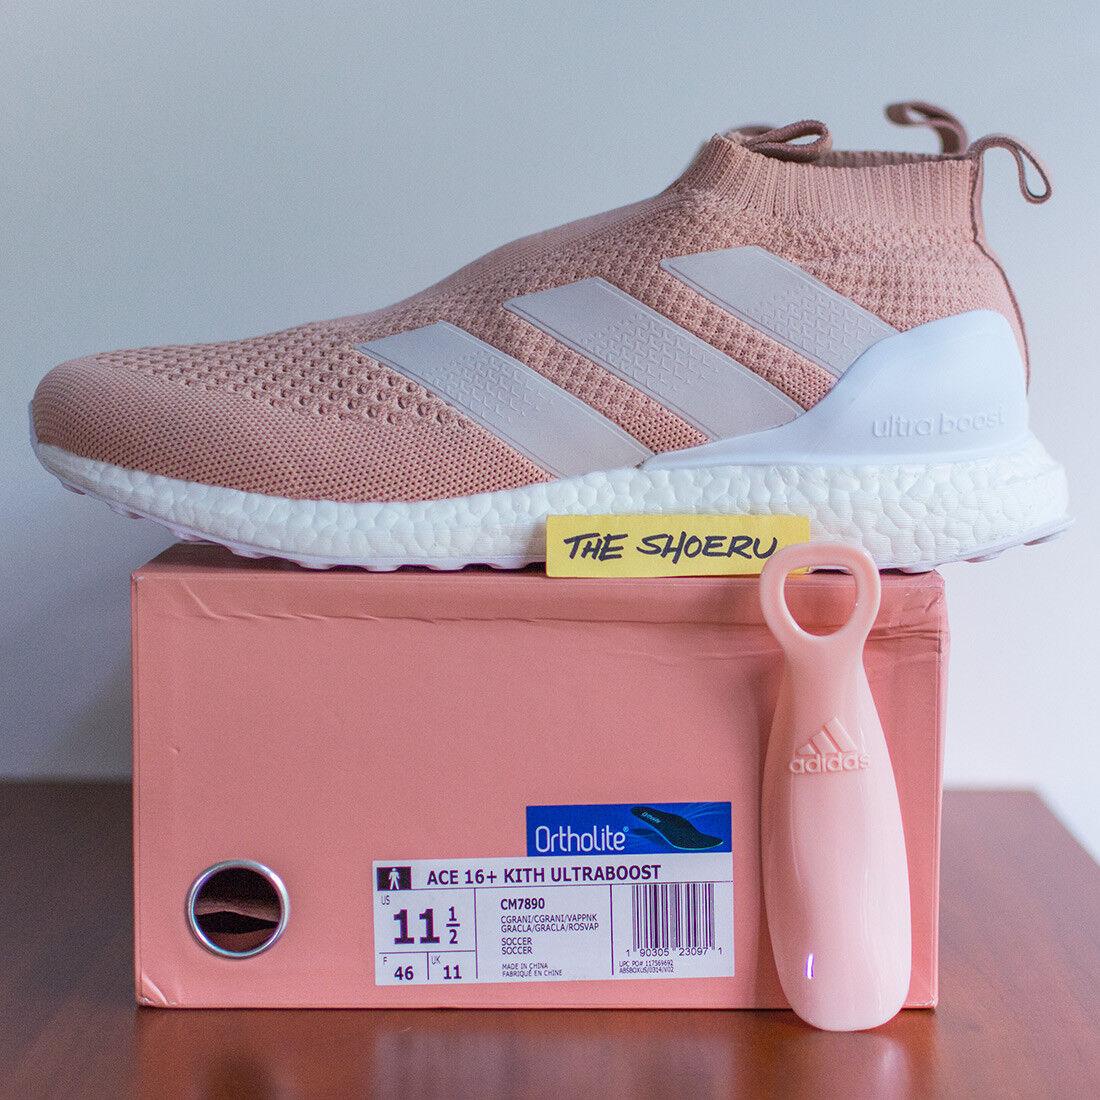 Adidas x Ronnie Fieg Ace 16+ Kith Ultraboost - Flamingo - copa DS Comfortable